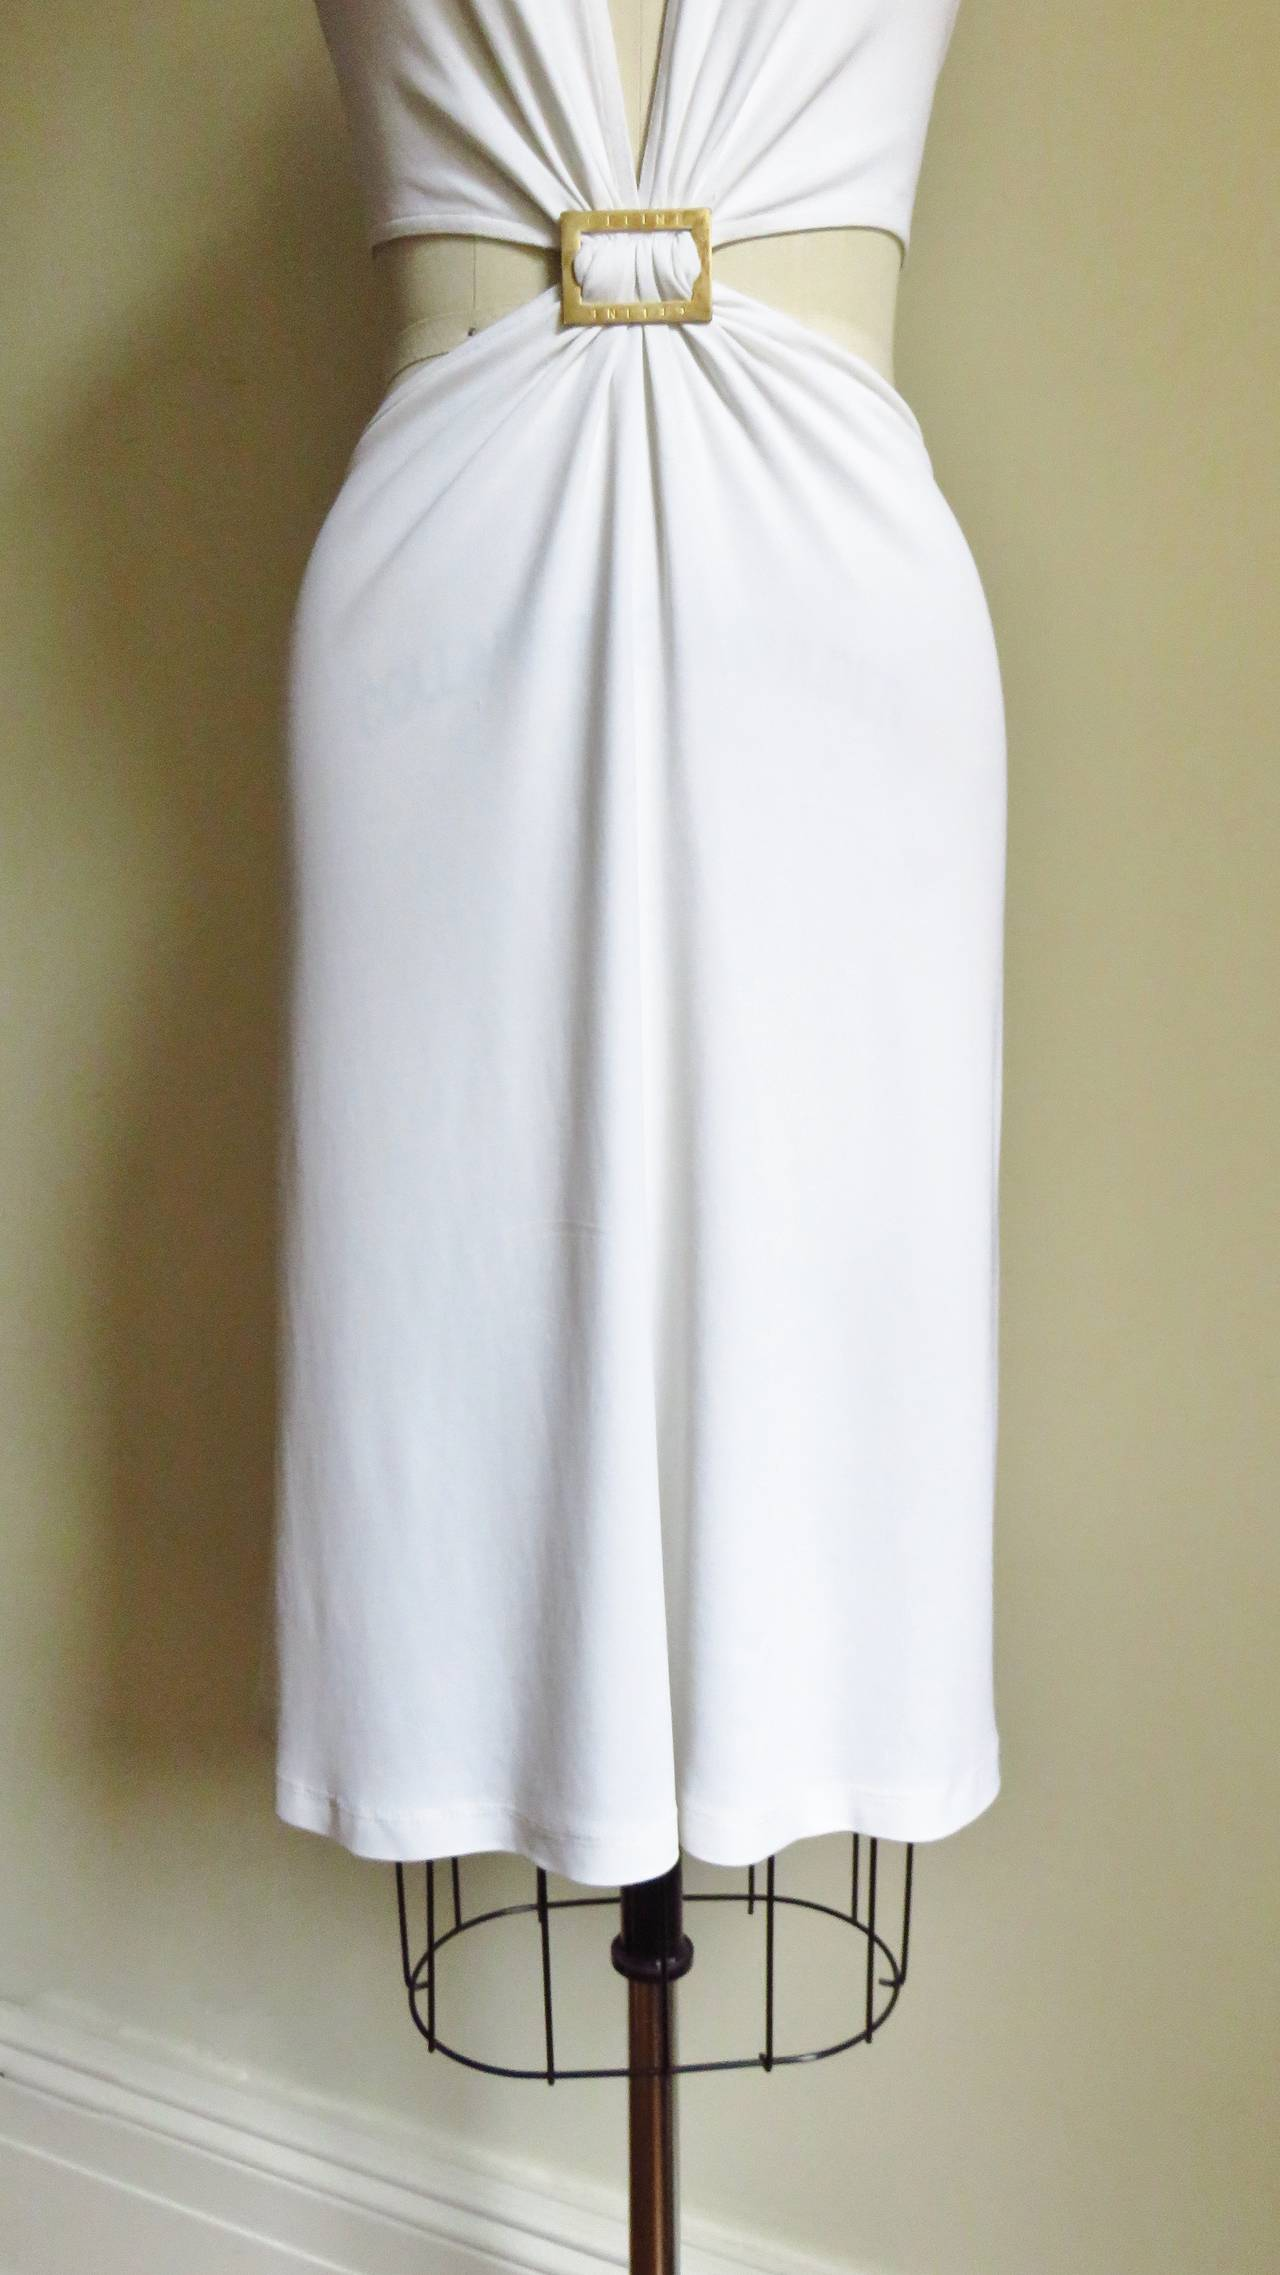 Celine Cutout Deep Plunge Halter Dress For Sale 1